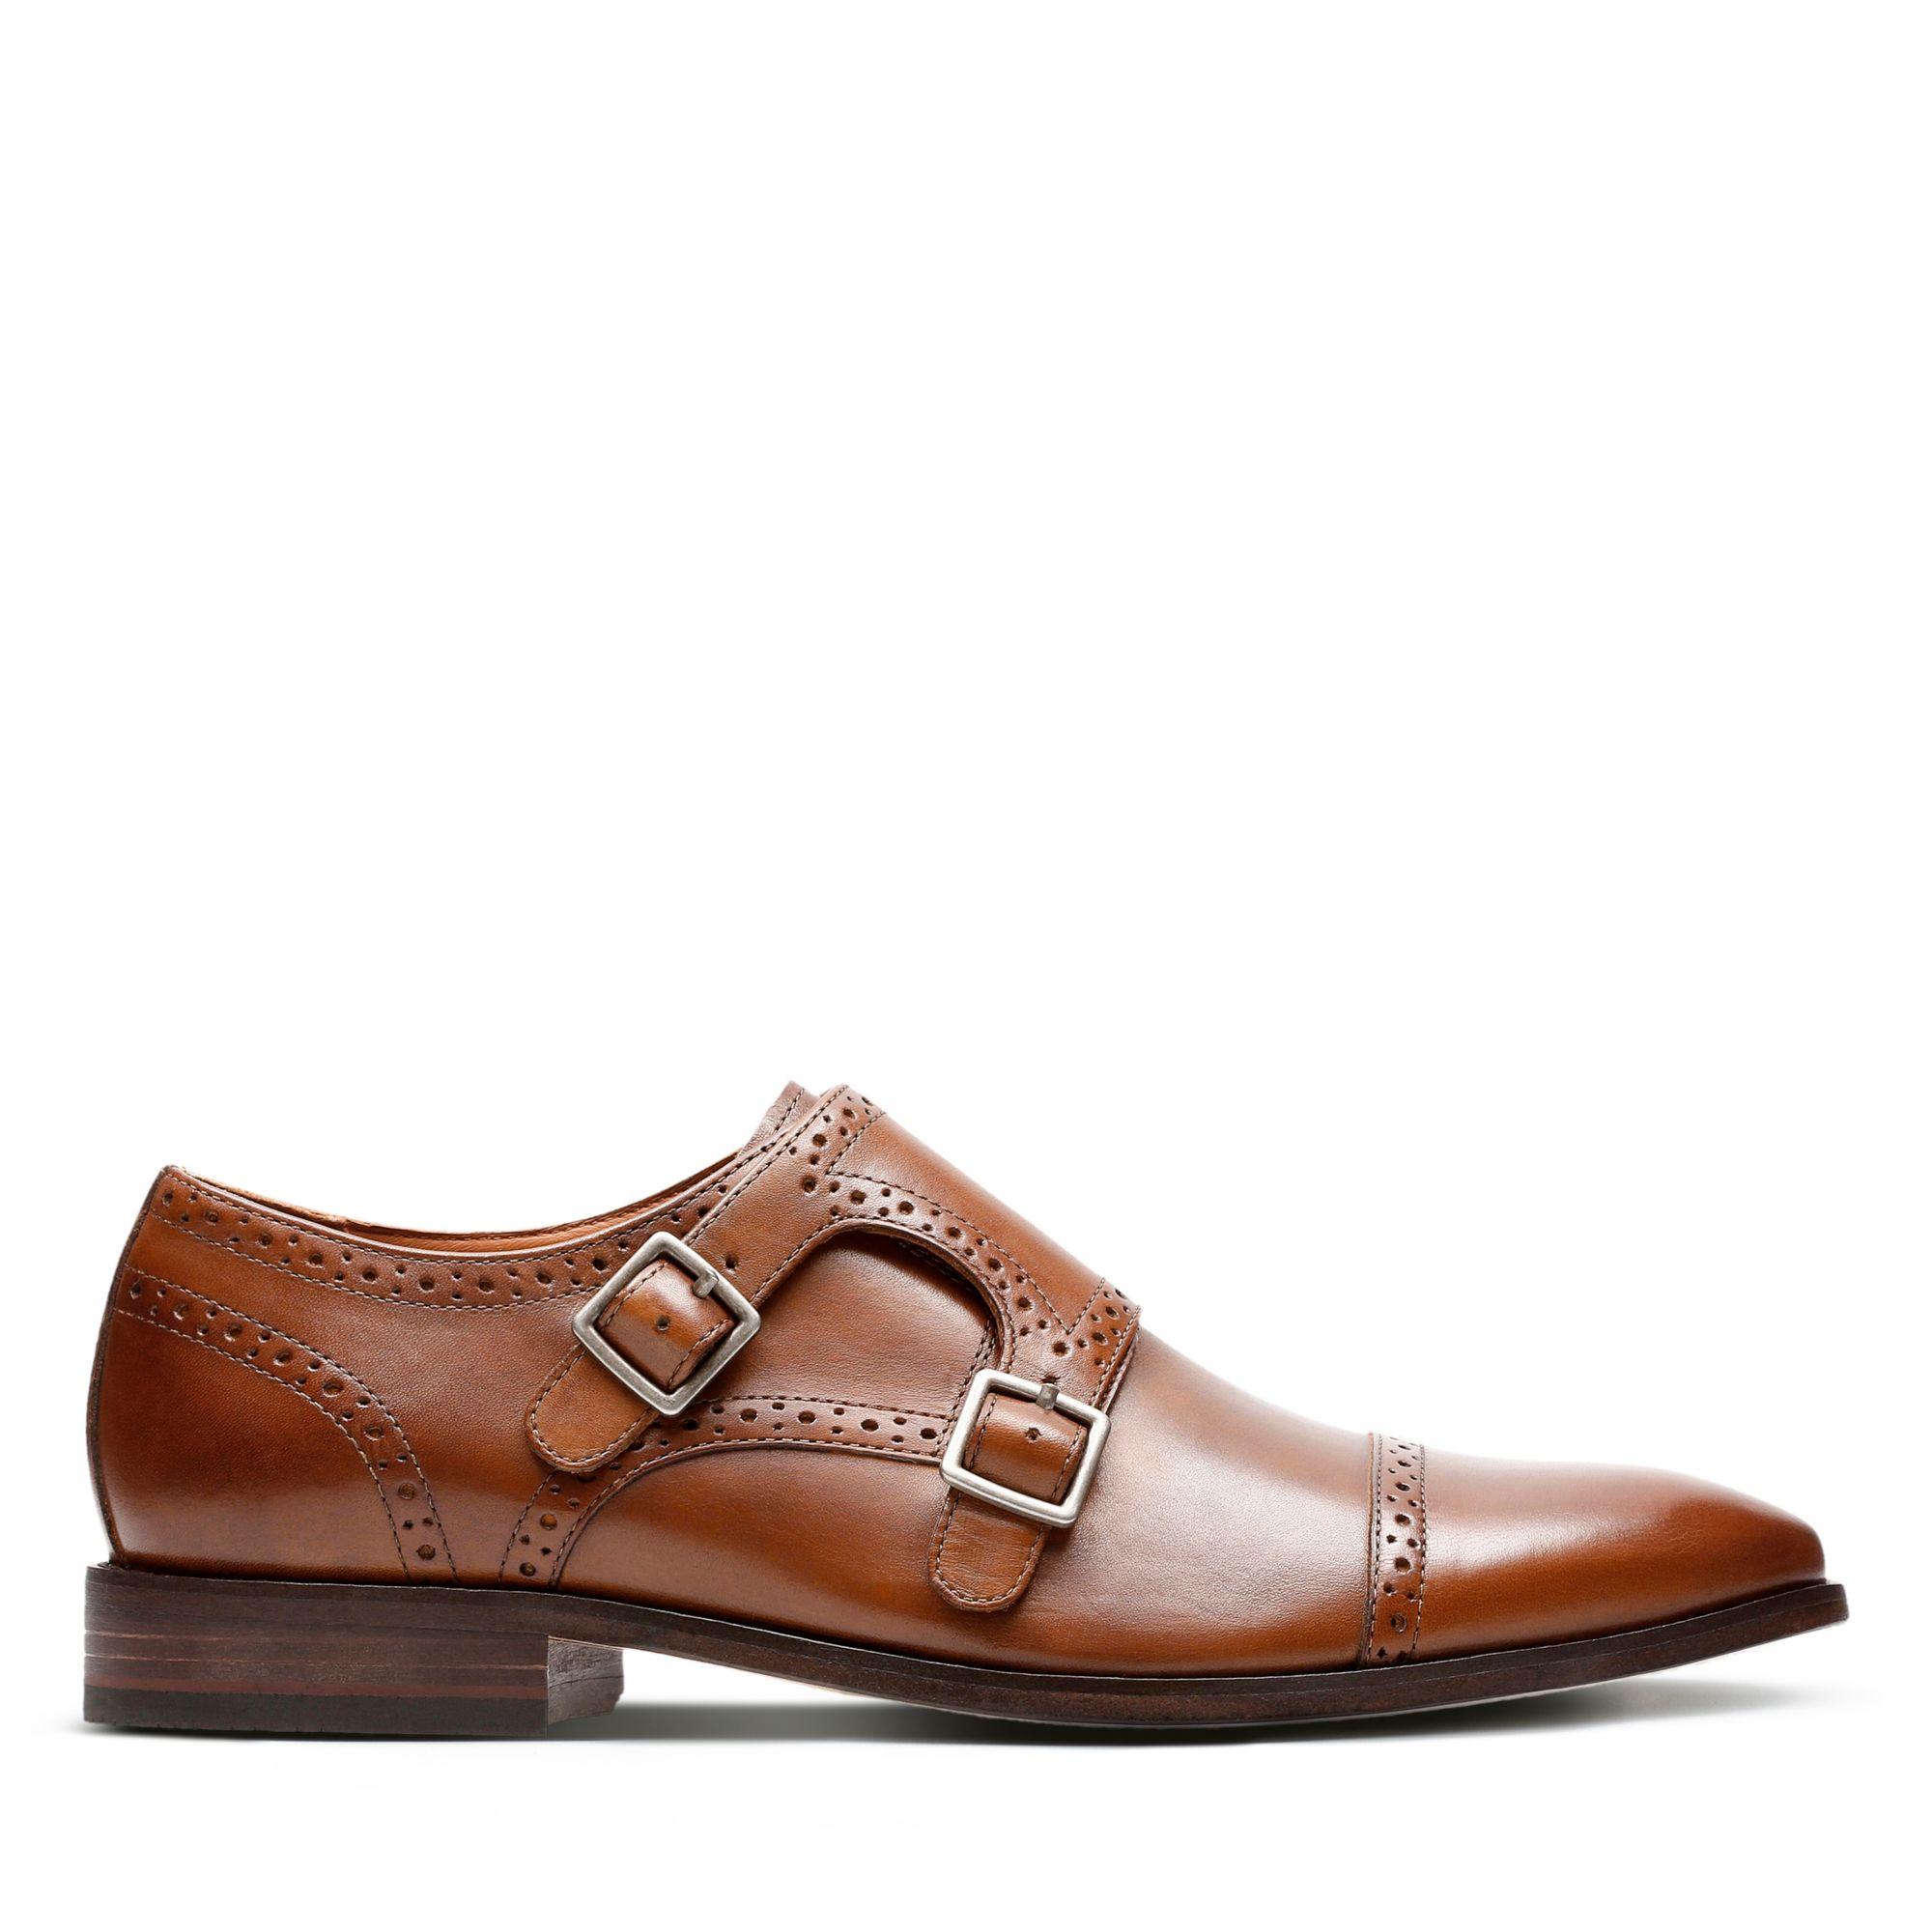 1950s Men's Clothing Clarks Nantasket Monk - Dark Tan Leather - Mens 12 Medium $120.00 AT vintagedancer.com